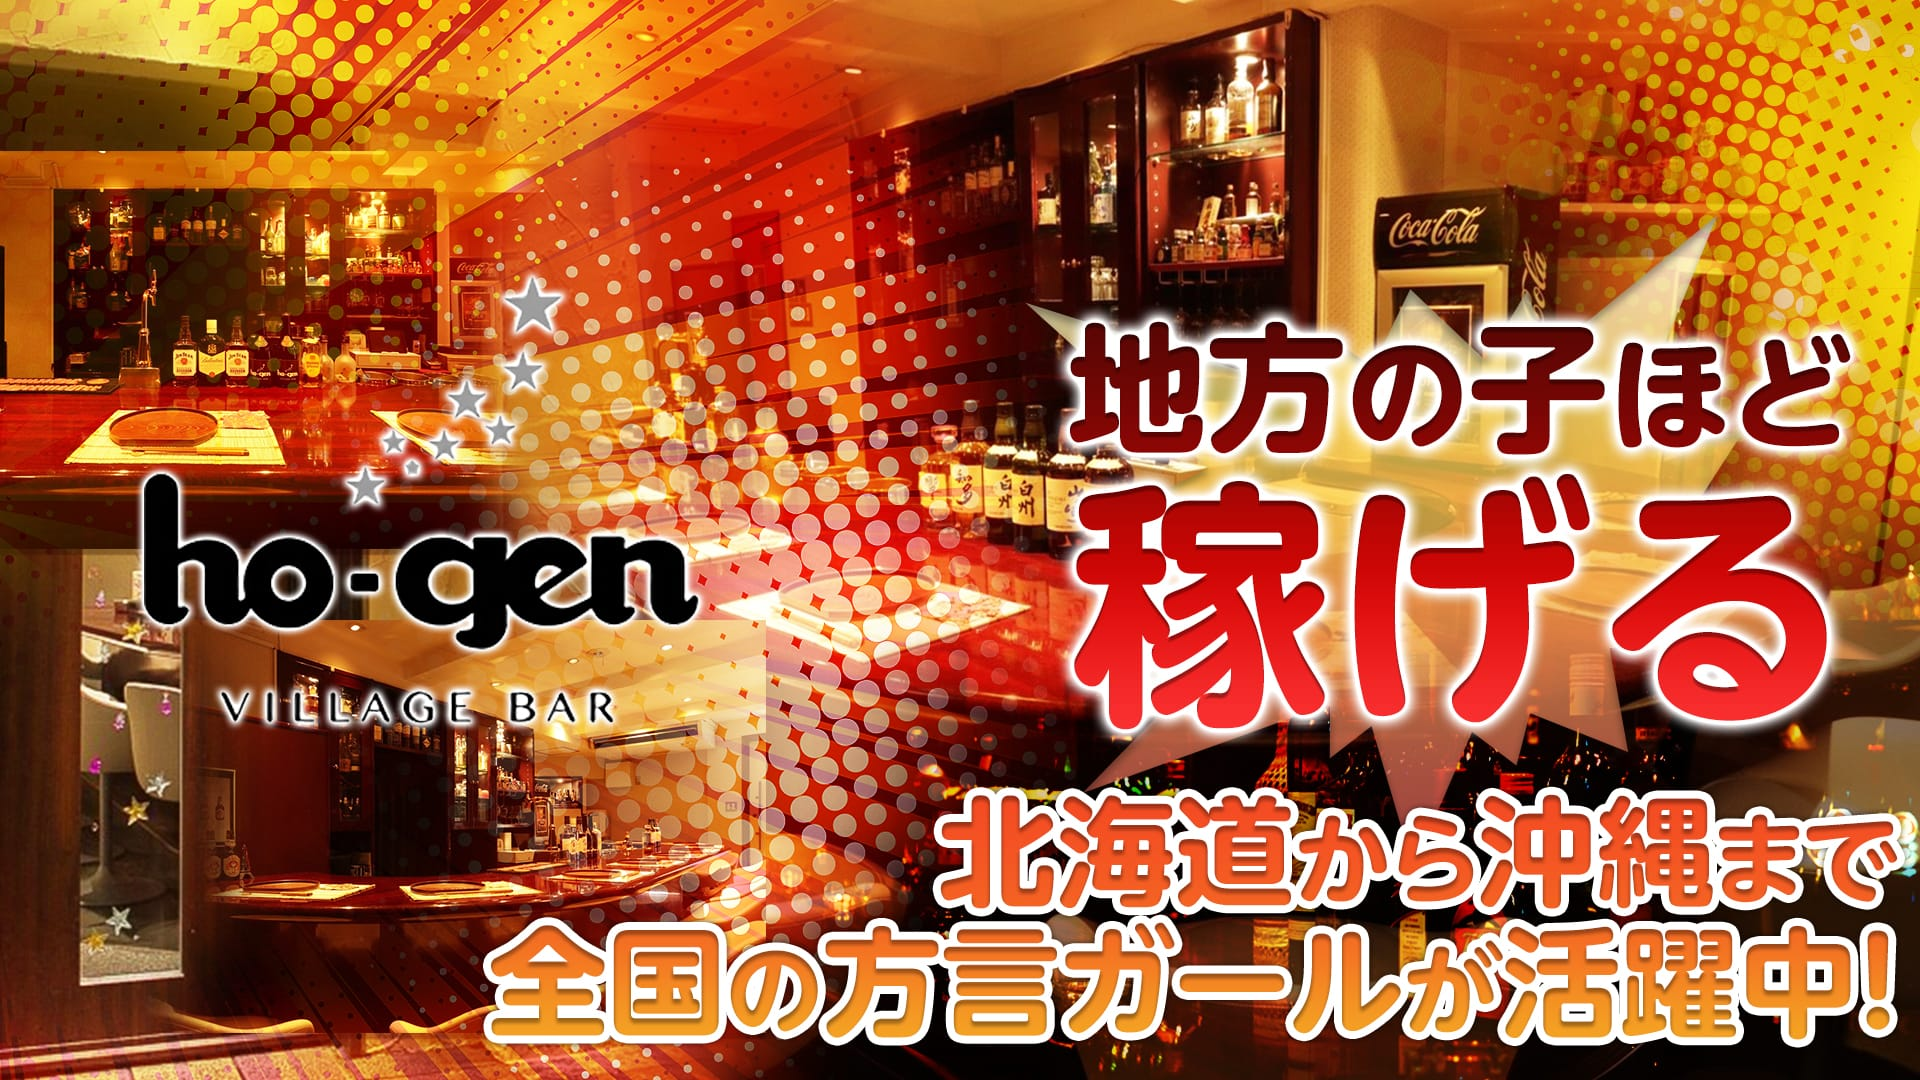 VILLAGE BAR ho-gen(ヴィレッジバーホーゲン) 神田ガールズバー TOP画像